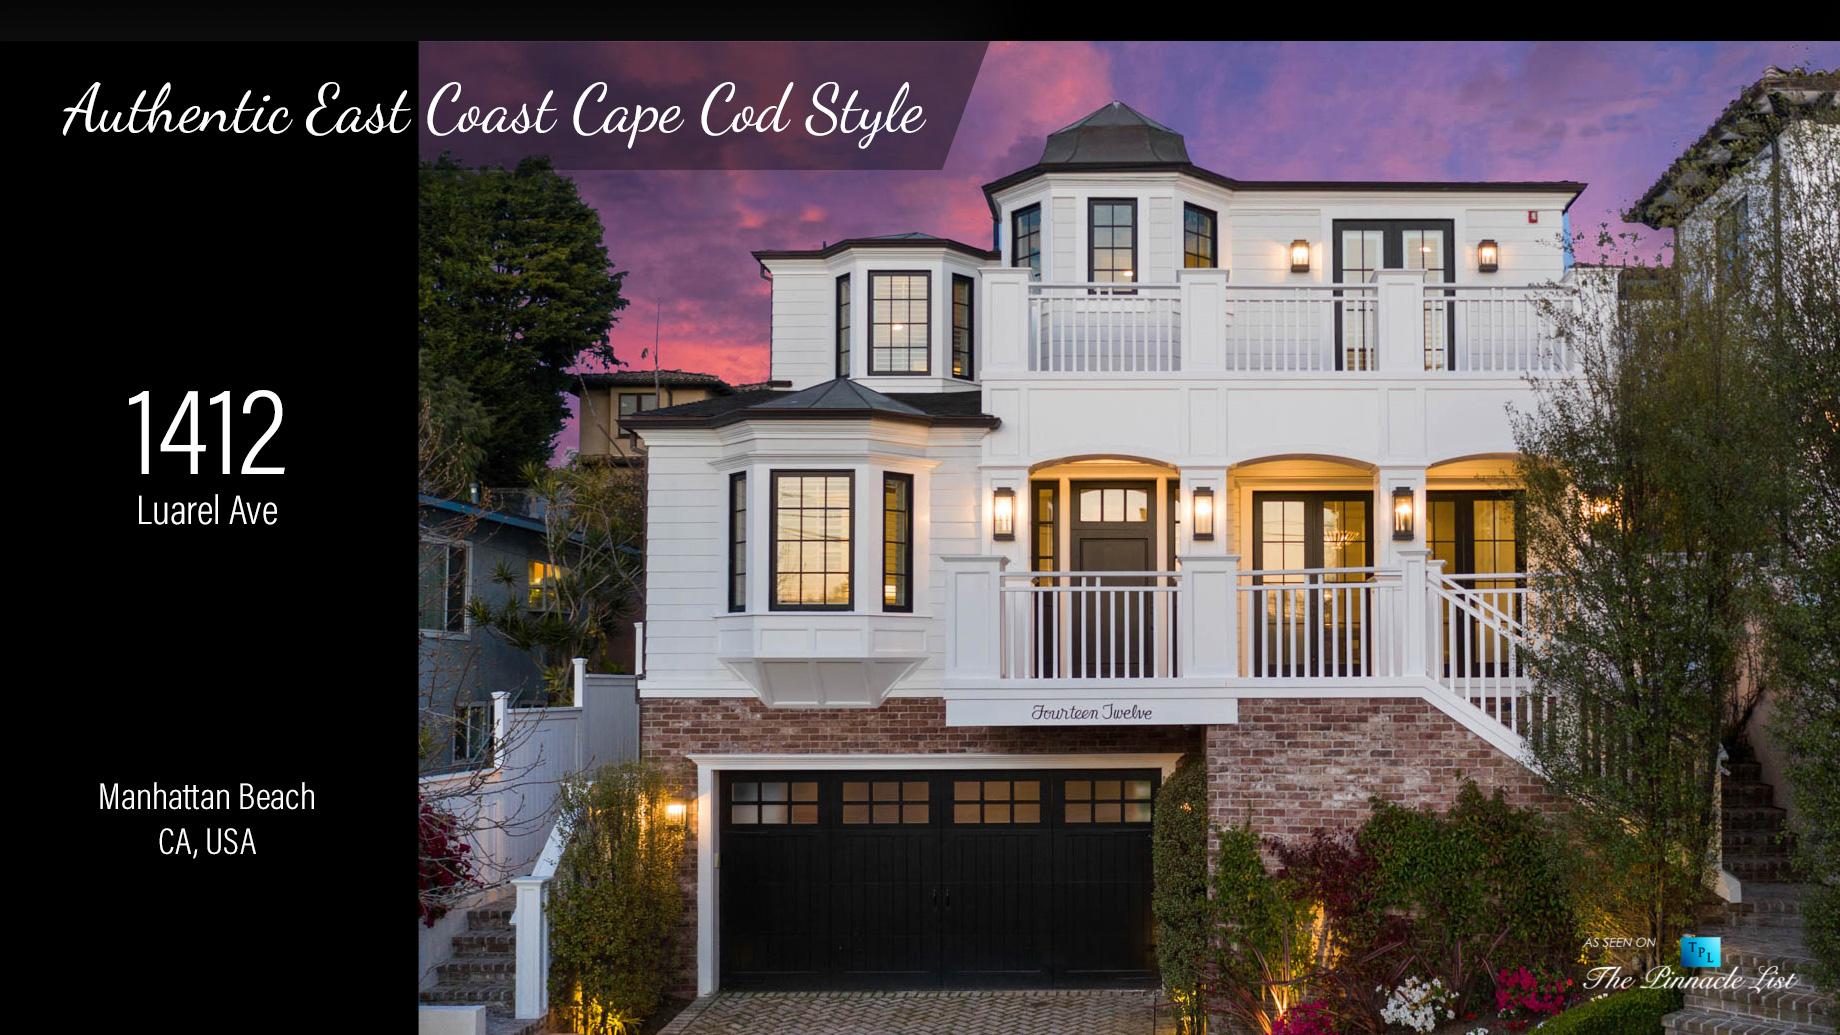 Authentic East Coast Cape Cod Style - 1412 Laurel Ave, Manhattan Beach, CA, USA